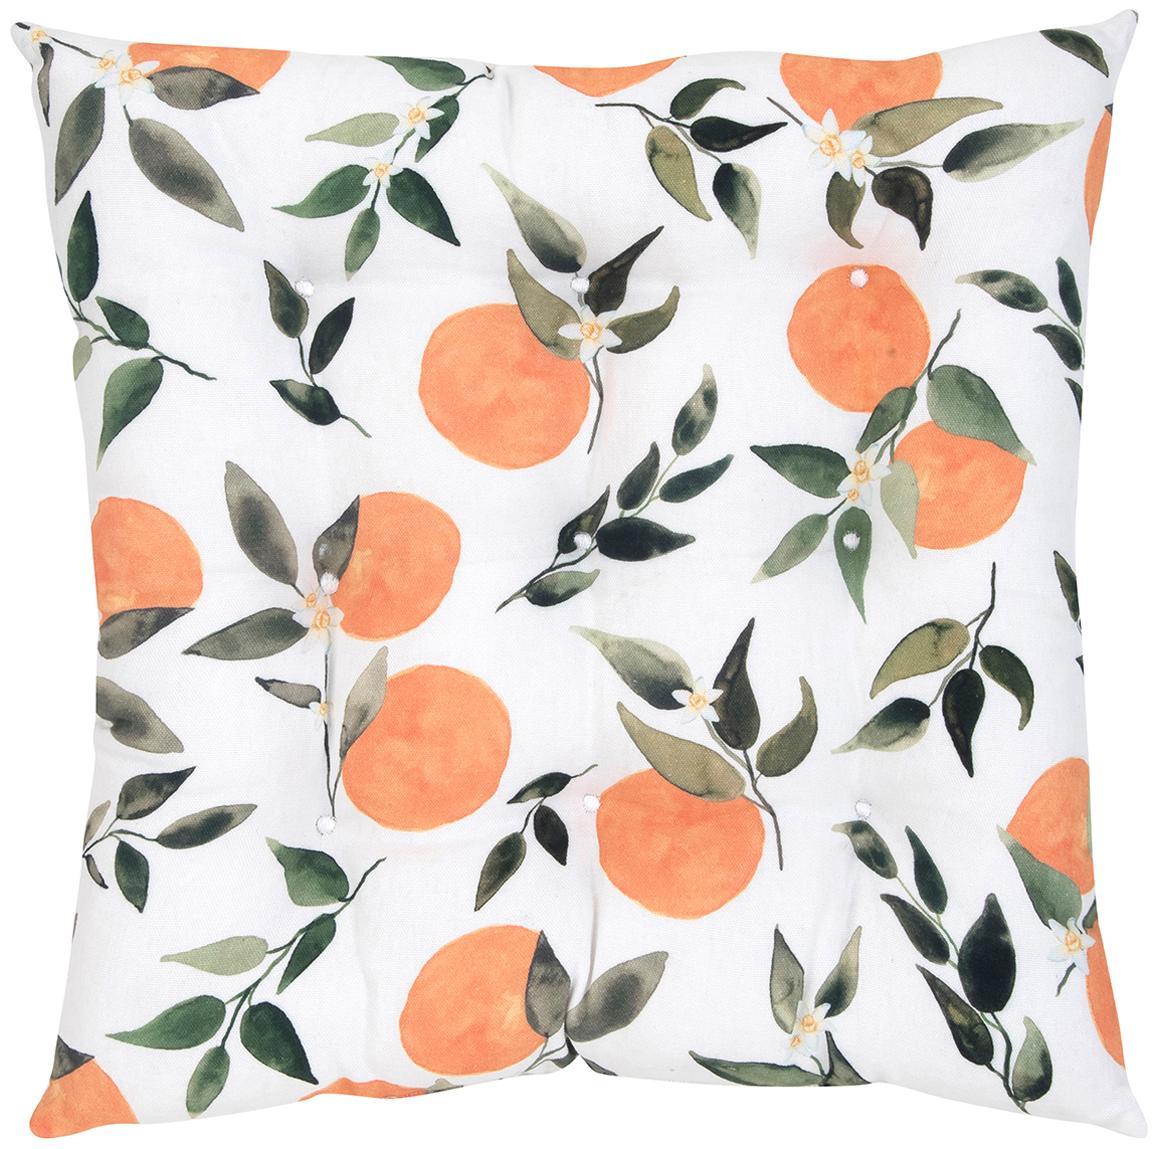 Cuscino sedia Larangina, Rivestimento: cotone, Bianco, verde, arancione, Larg. 40 x Lung. 40 cm